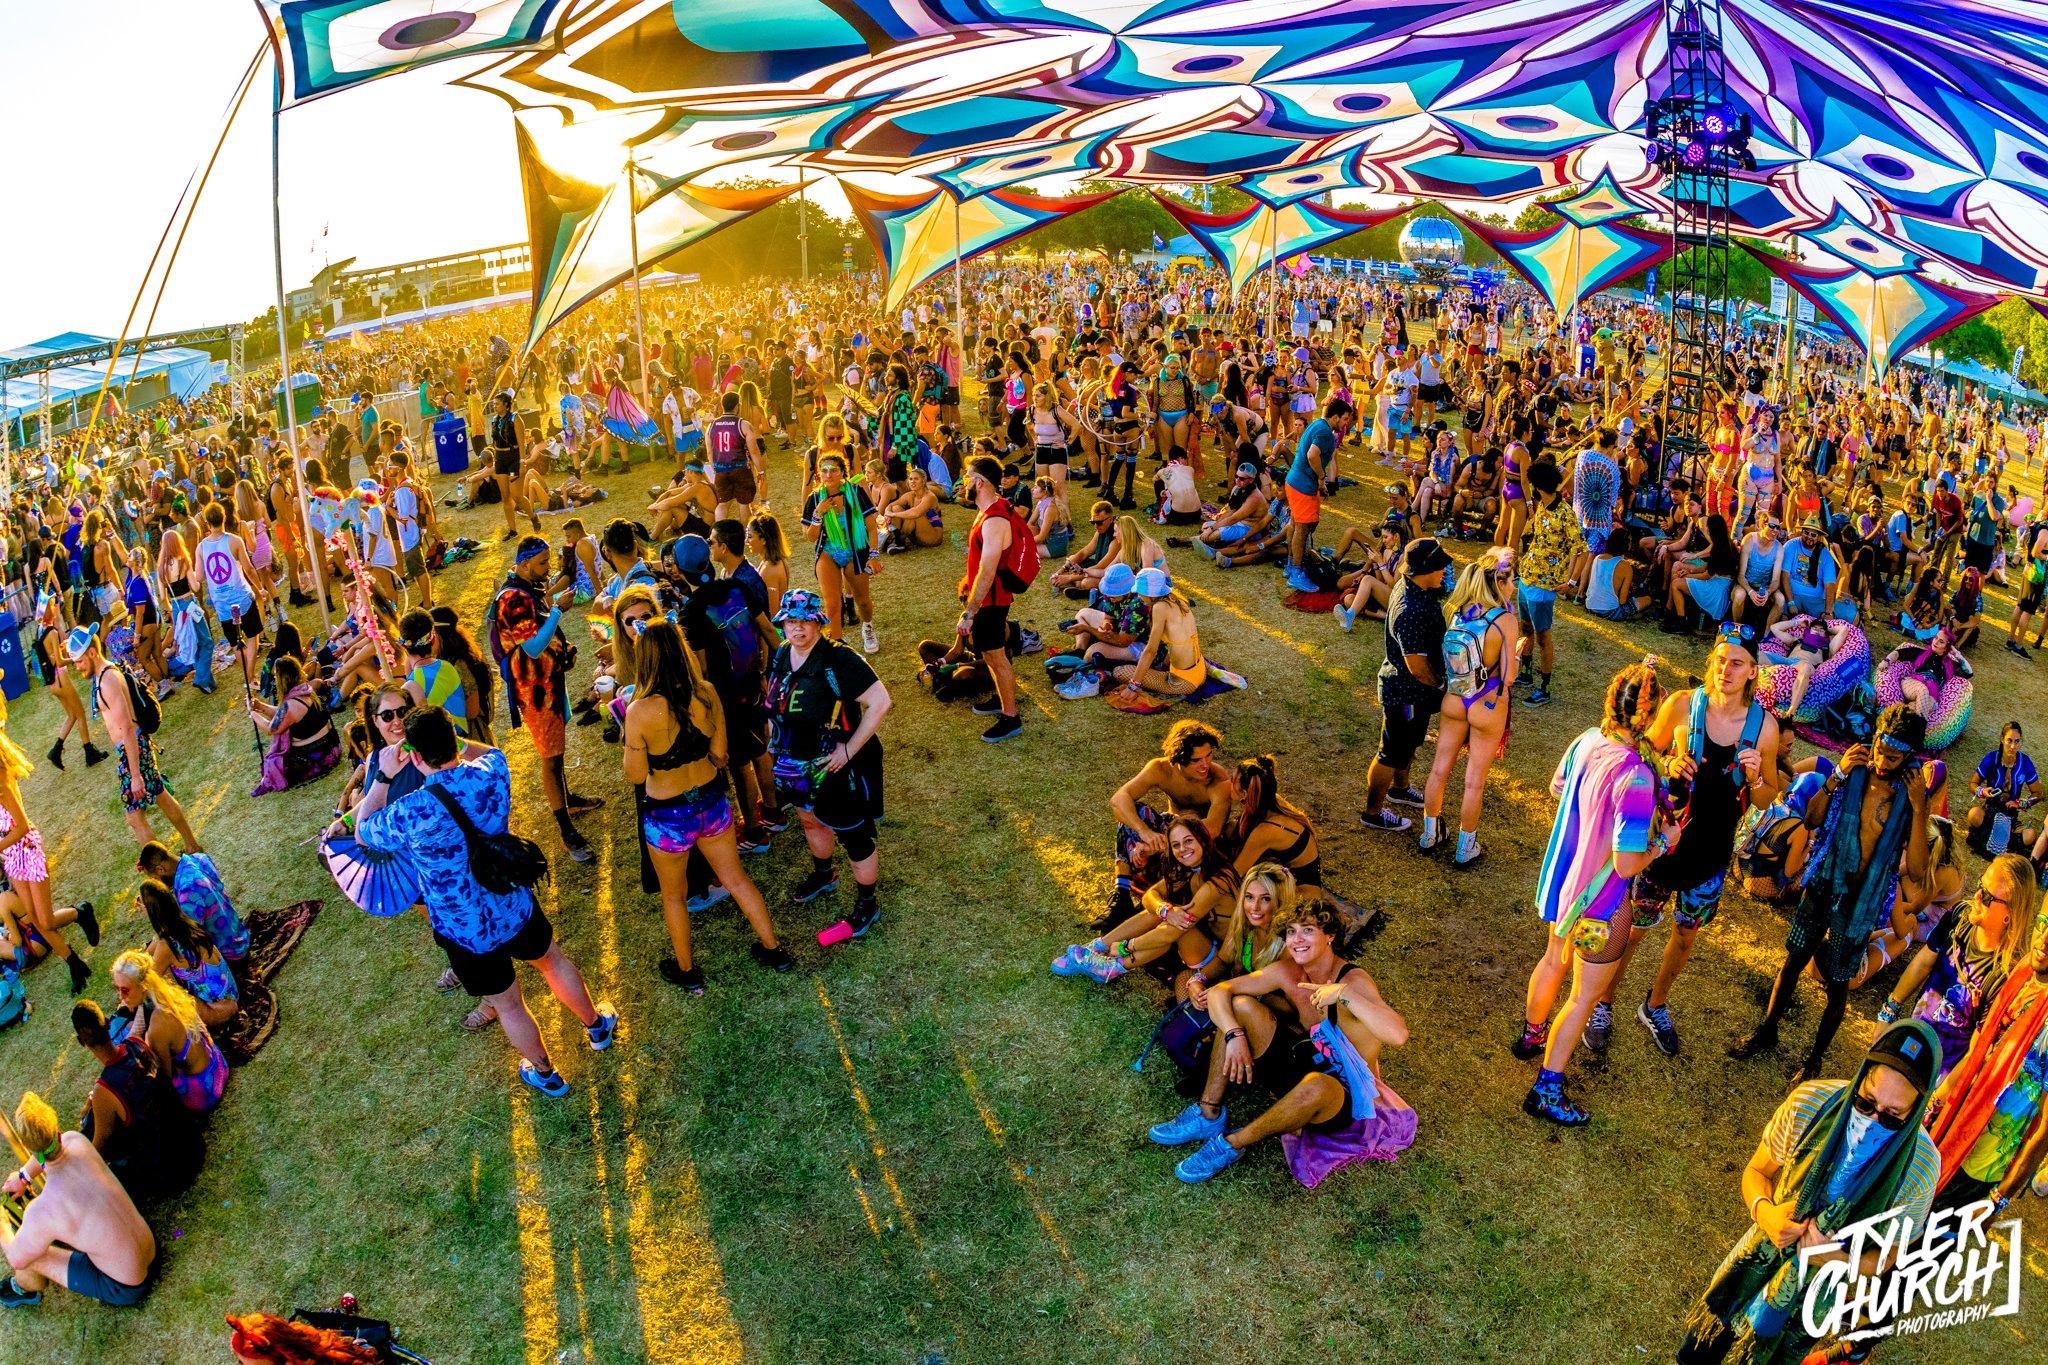 Sunset Music Festival 2021 Tents